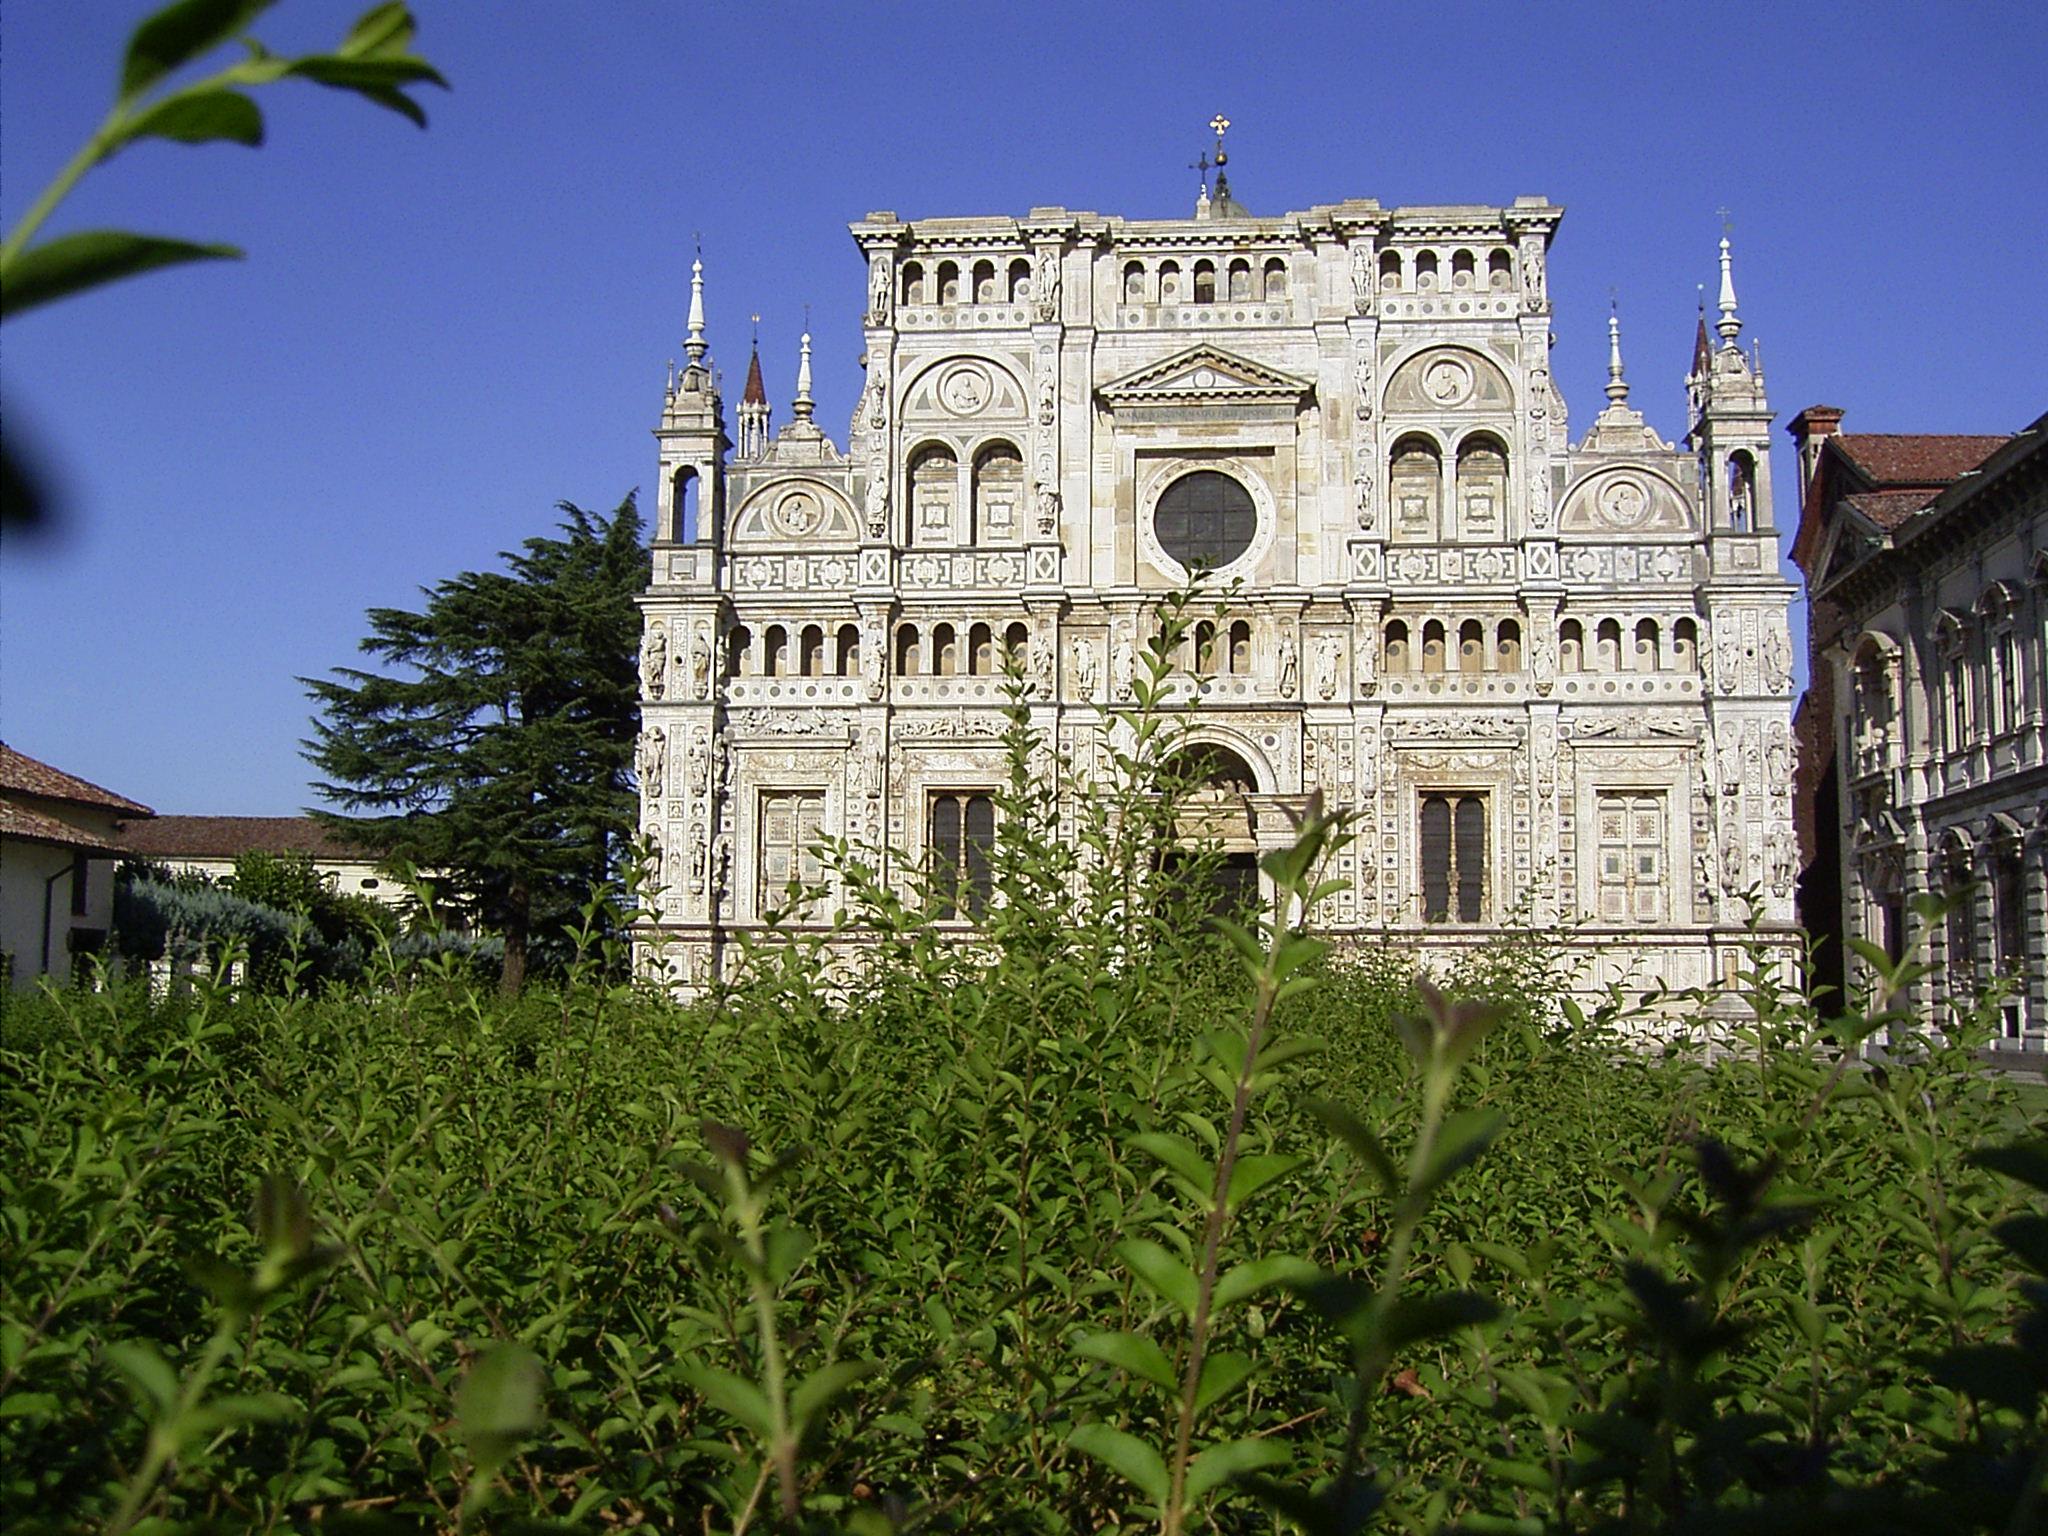 https://upload.wikimedia.org/wikipedia/commons/0/00/Certosa_-_facciata.JPG